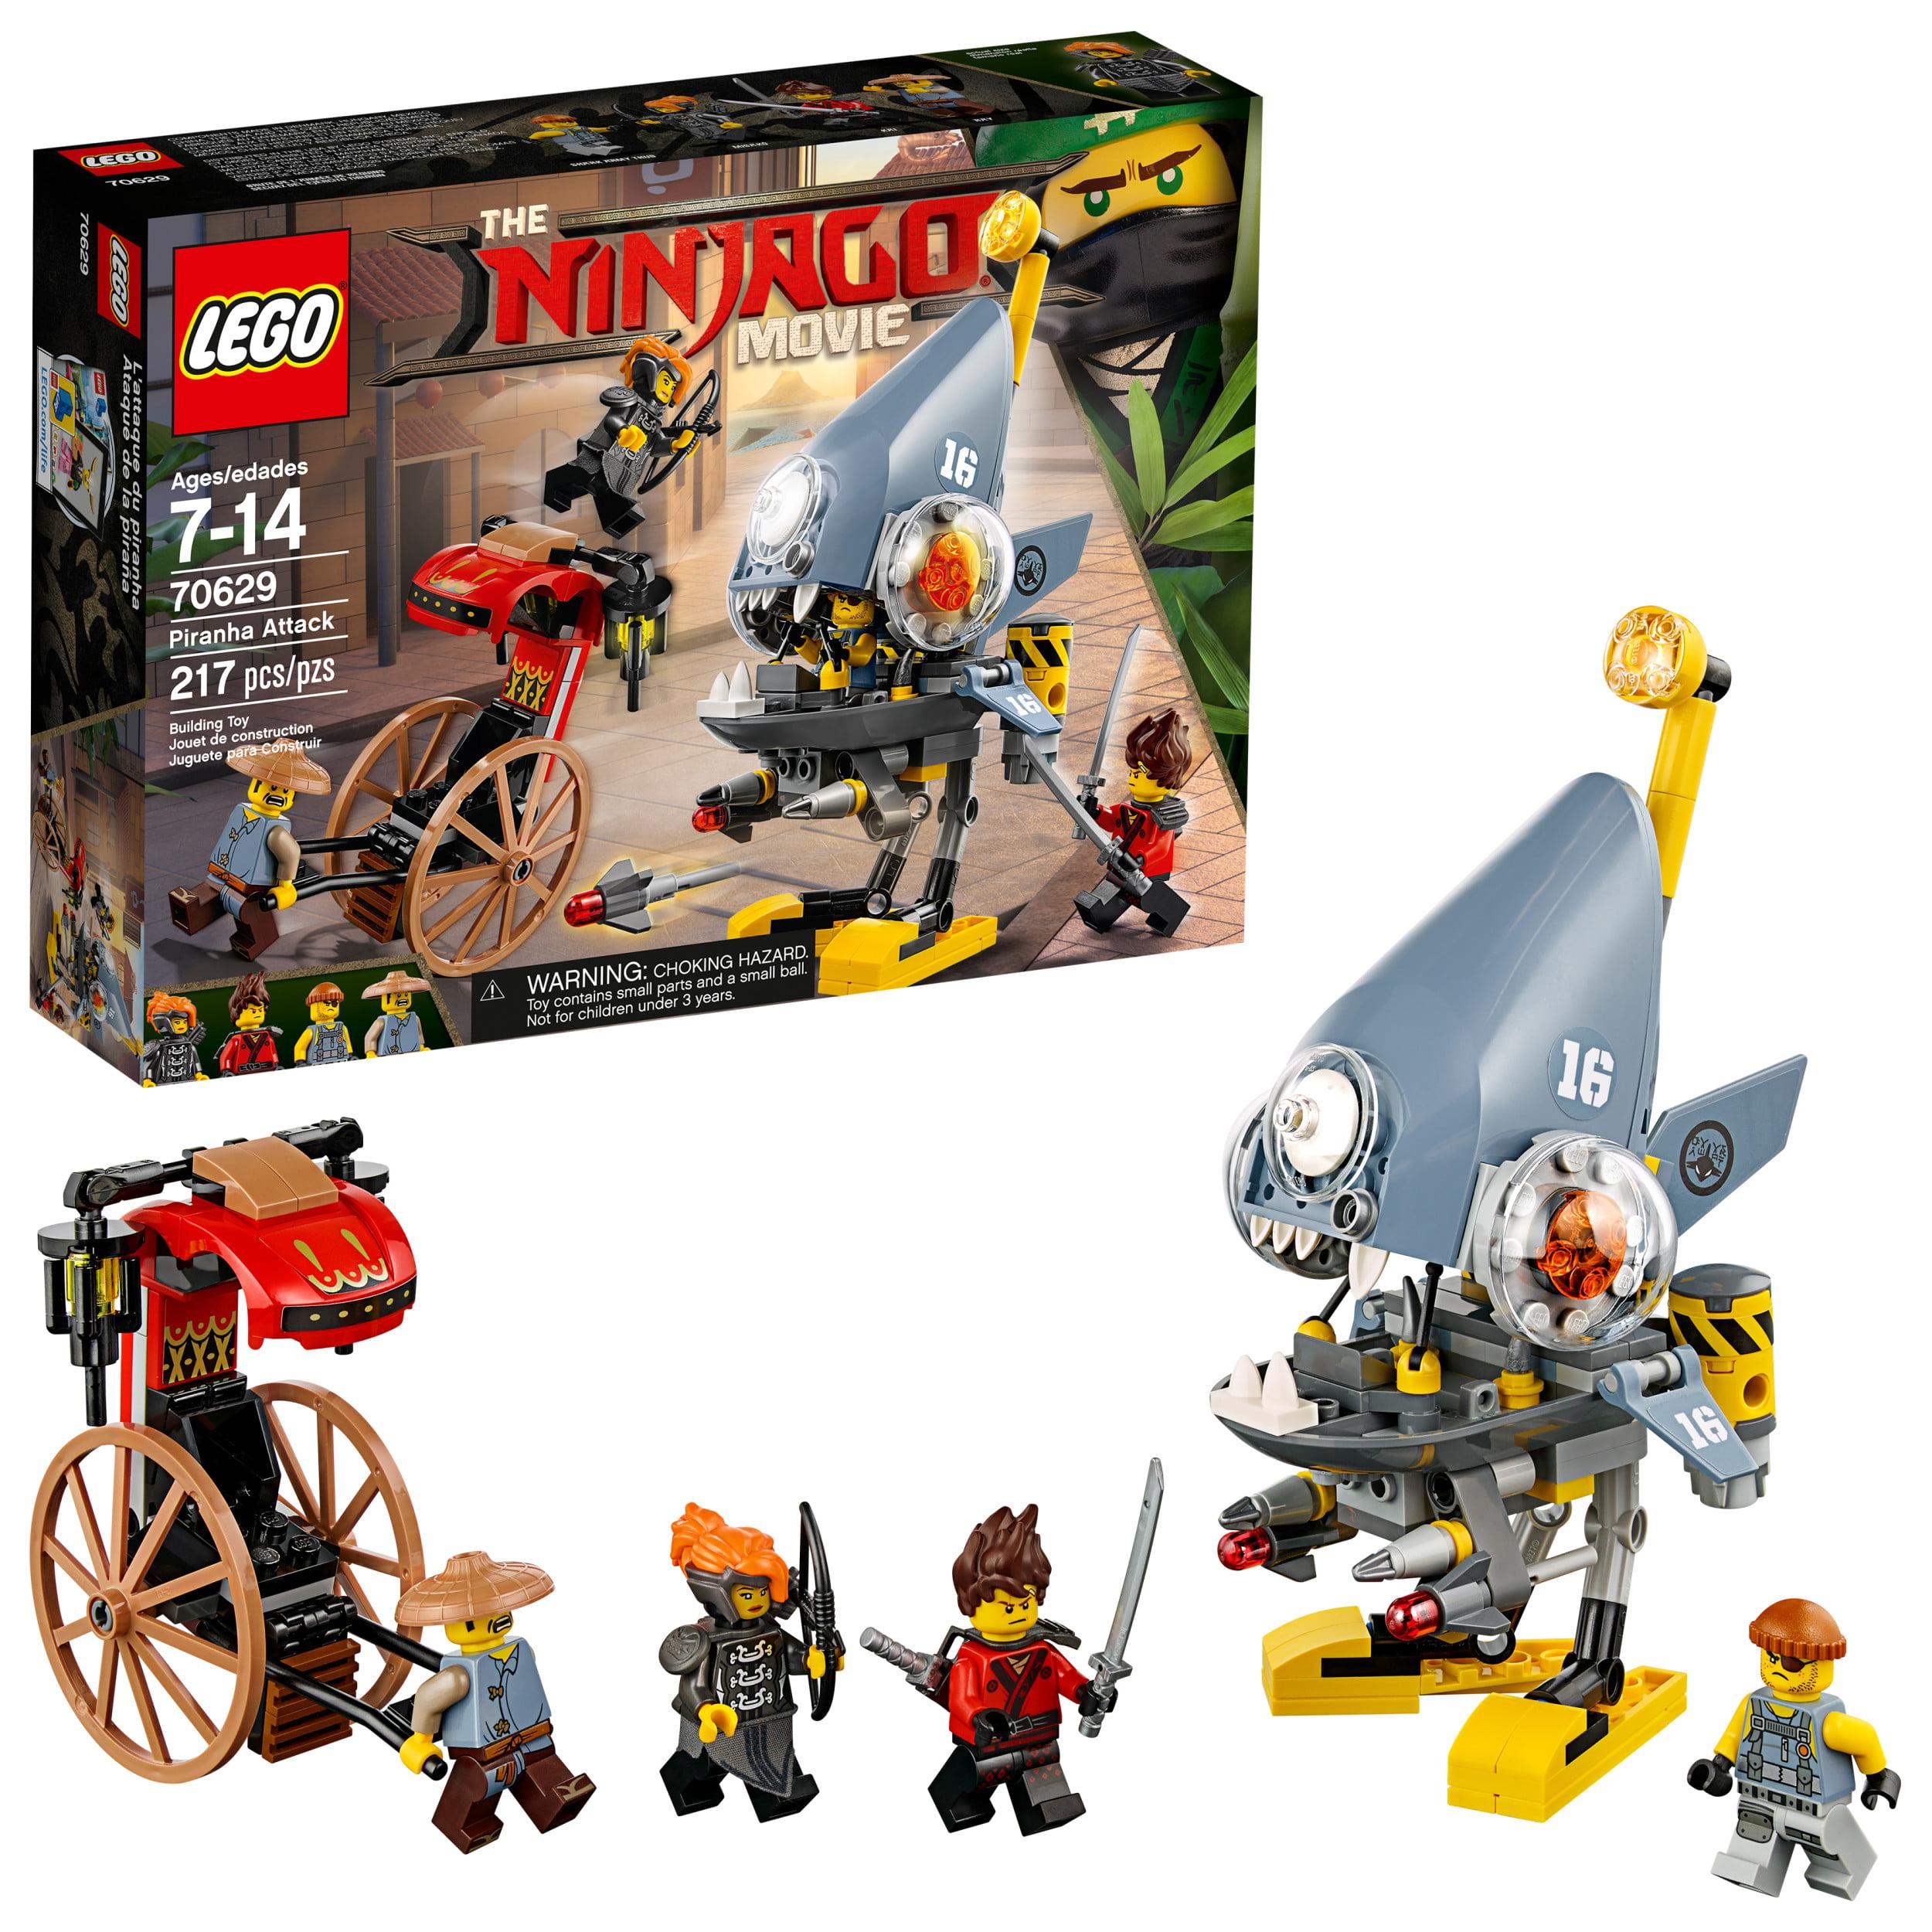 LEGO Ninjago Movie Piranha Attack 70629 (217 Pieces)